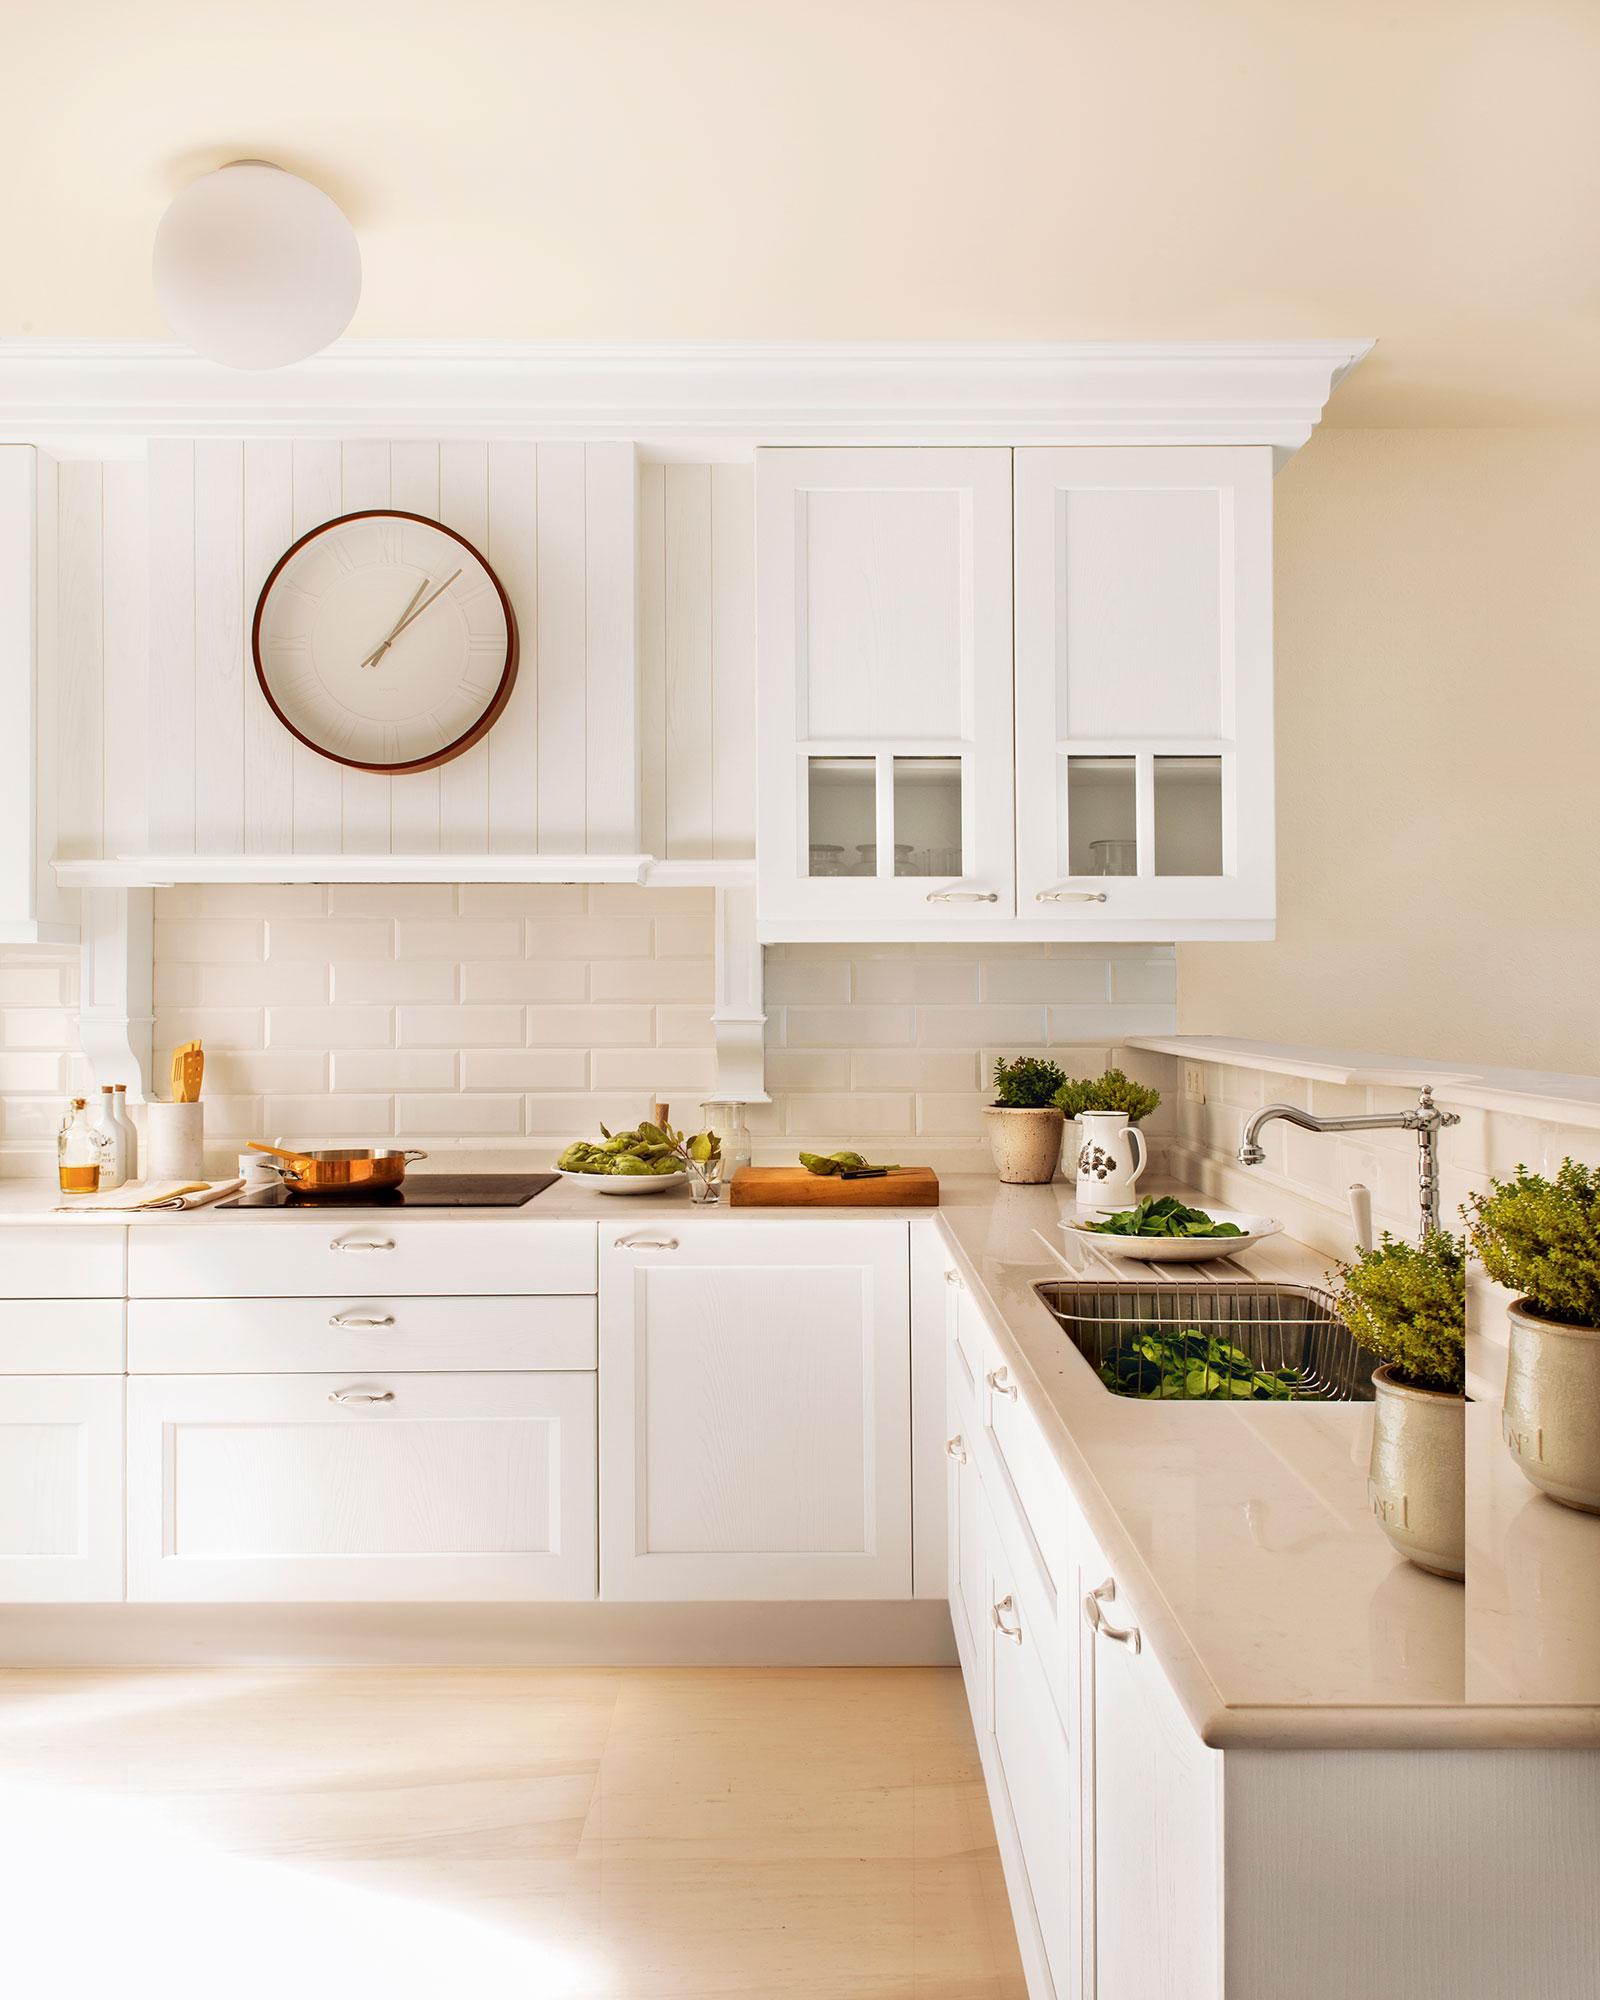 23 hermoso como limpiar baldosas cocina galer a de - Como limpiar azulejos de cocina ...